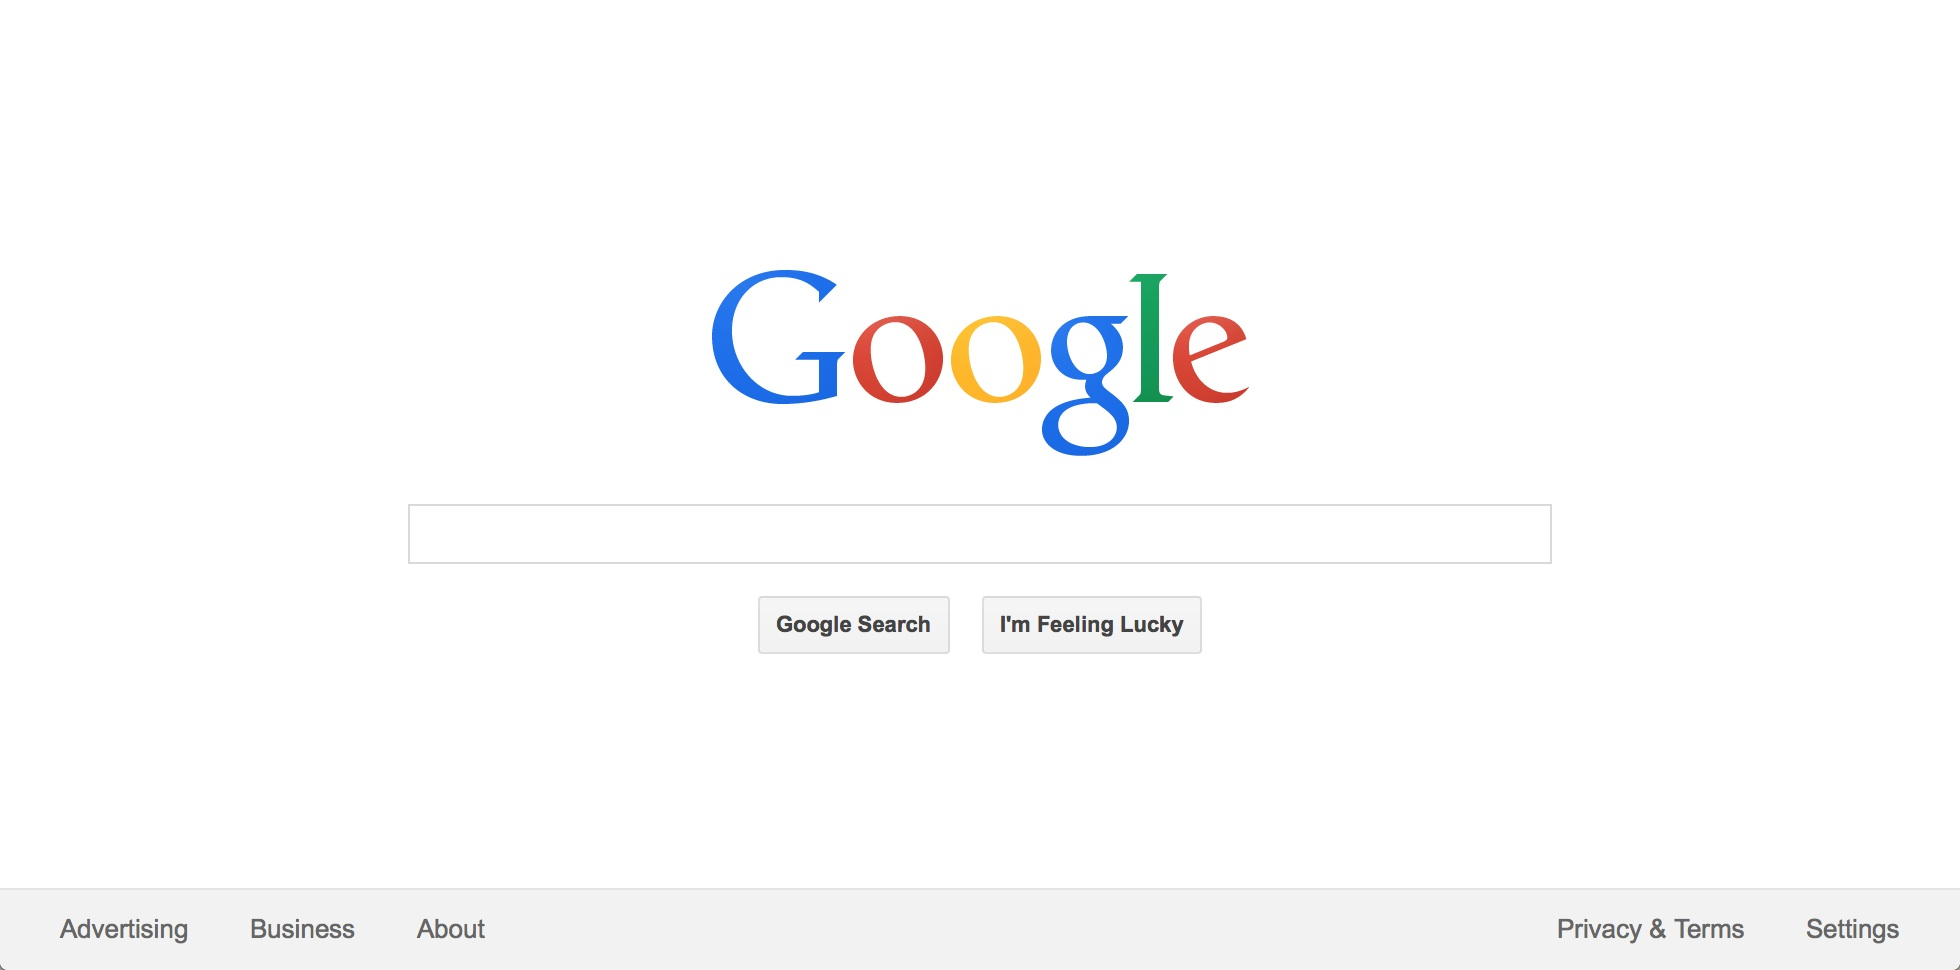 Google's Google